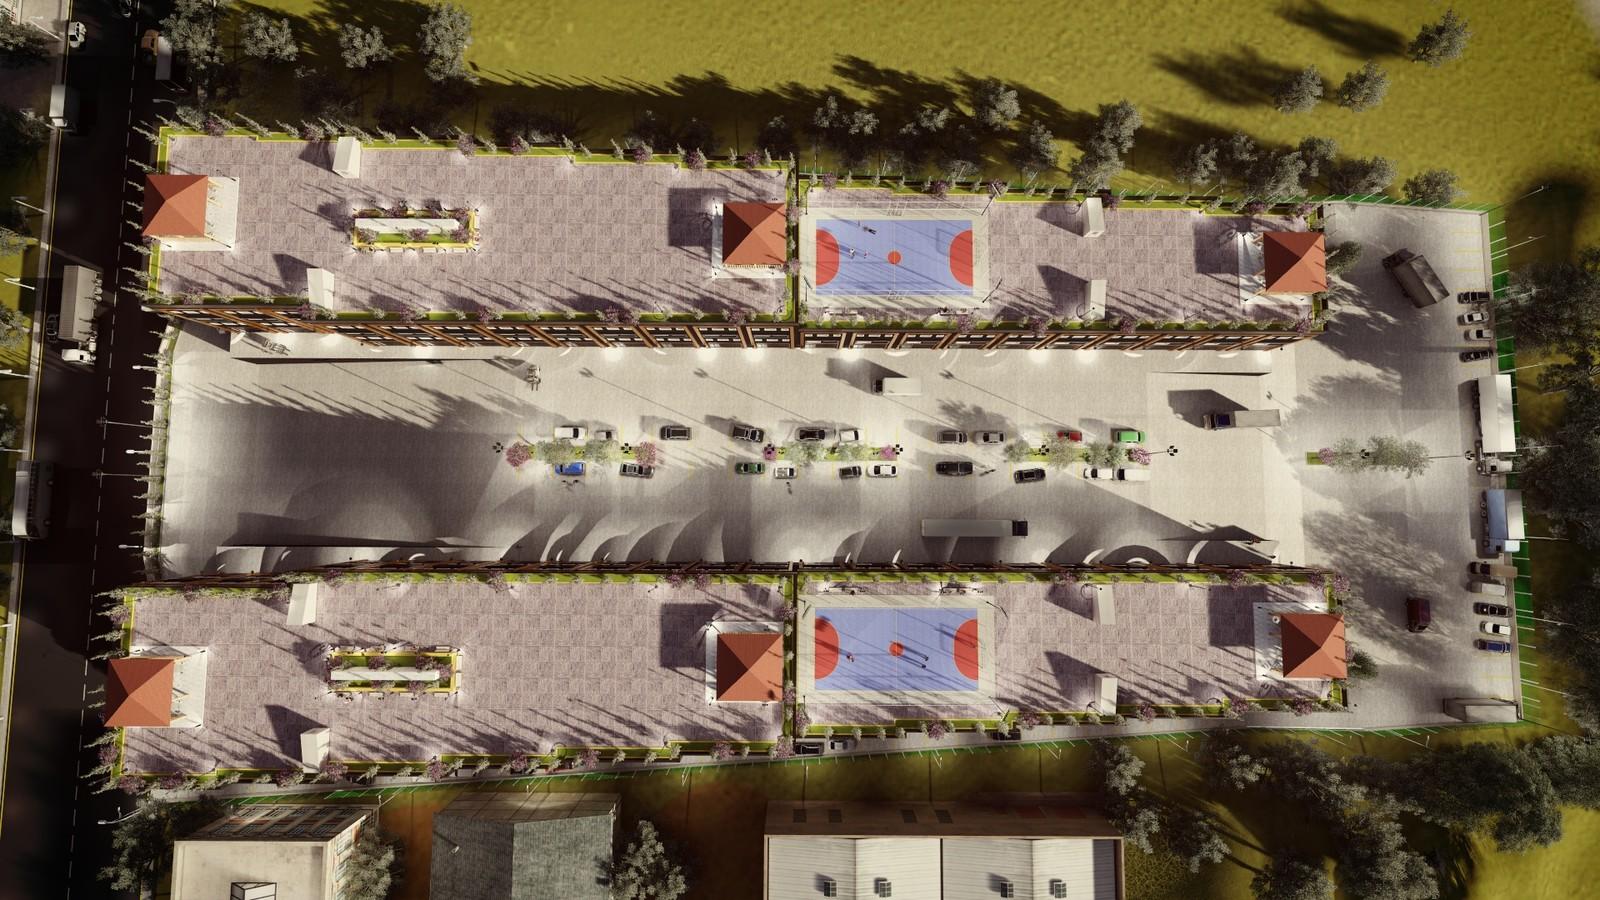 ModSan Industry Area Plan  #istanbul  #pendik #tuzla #industry #cgi #architecture #3dvisualization